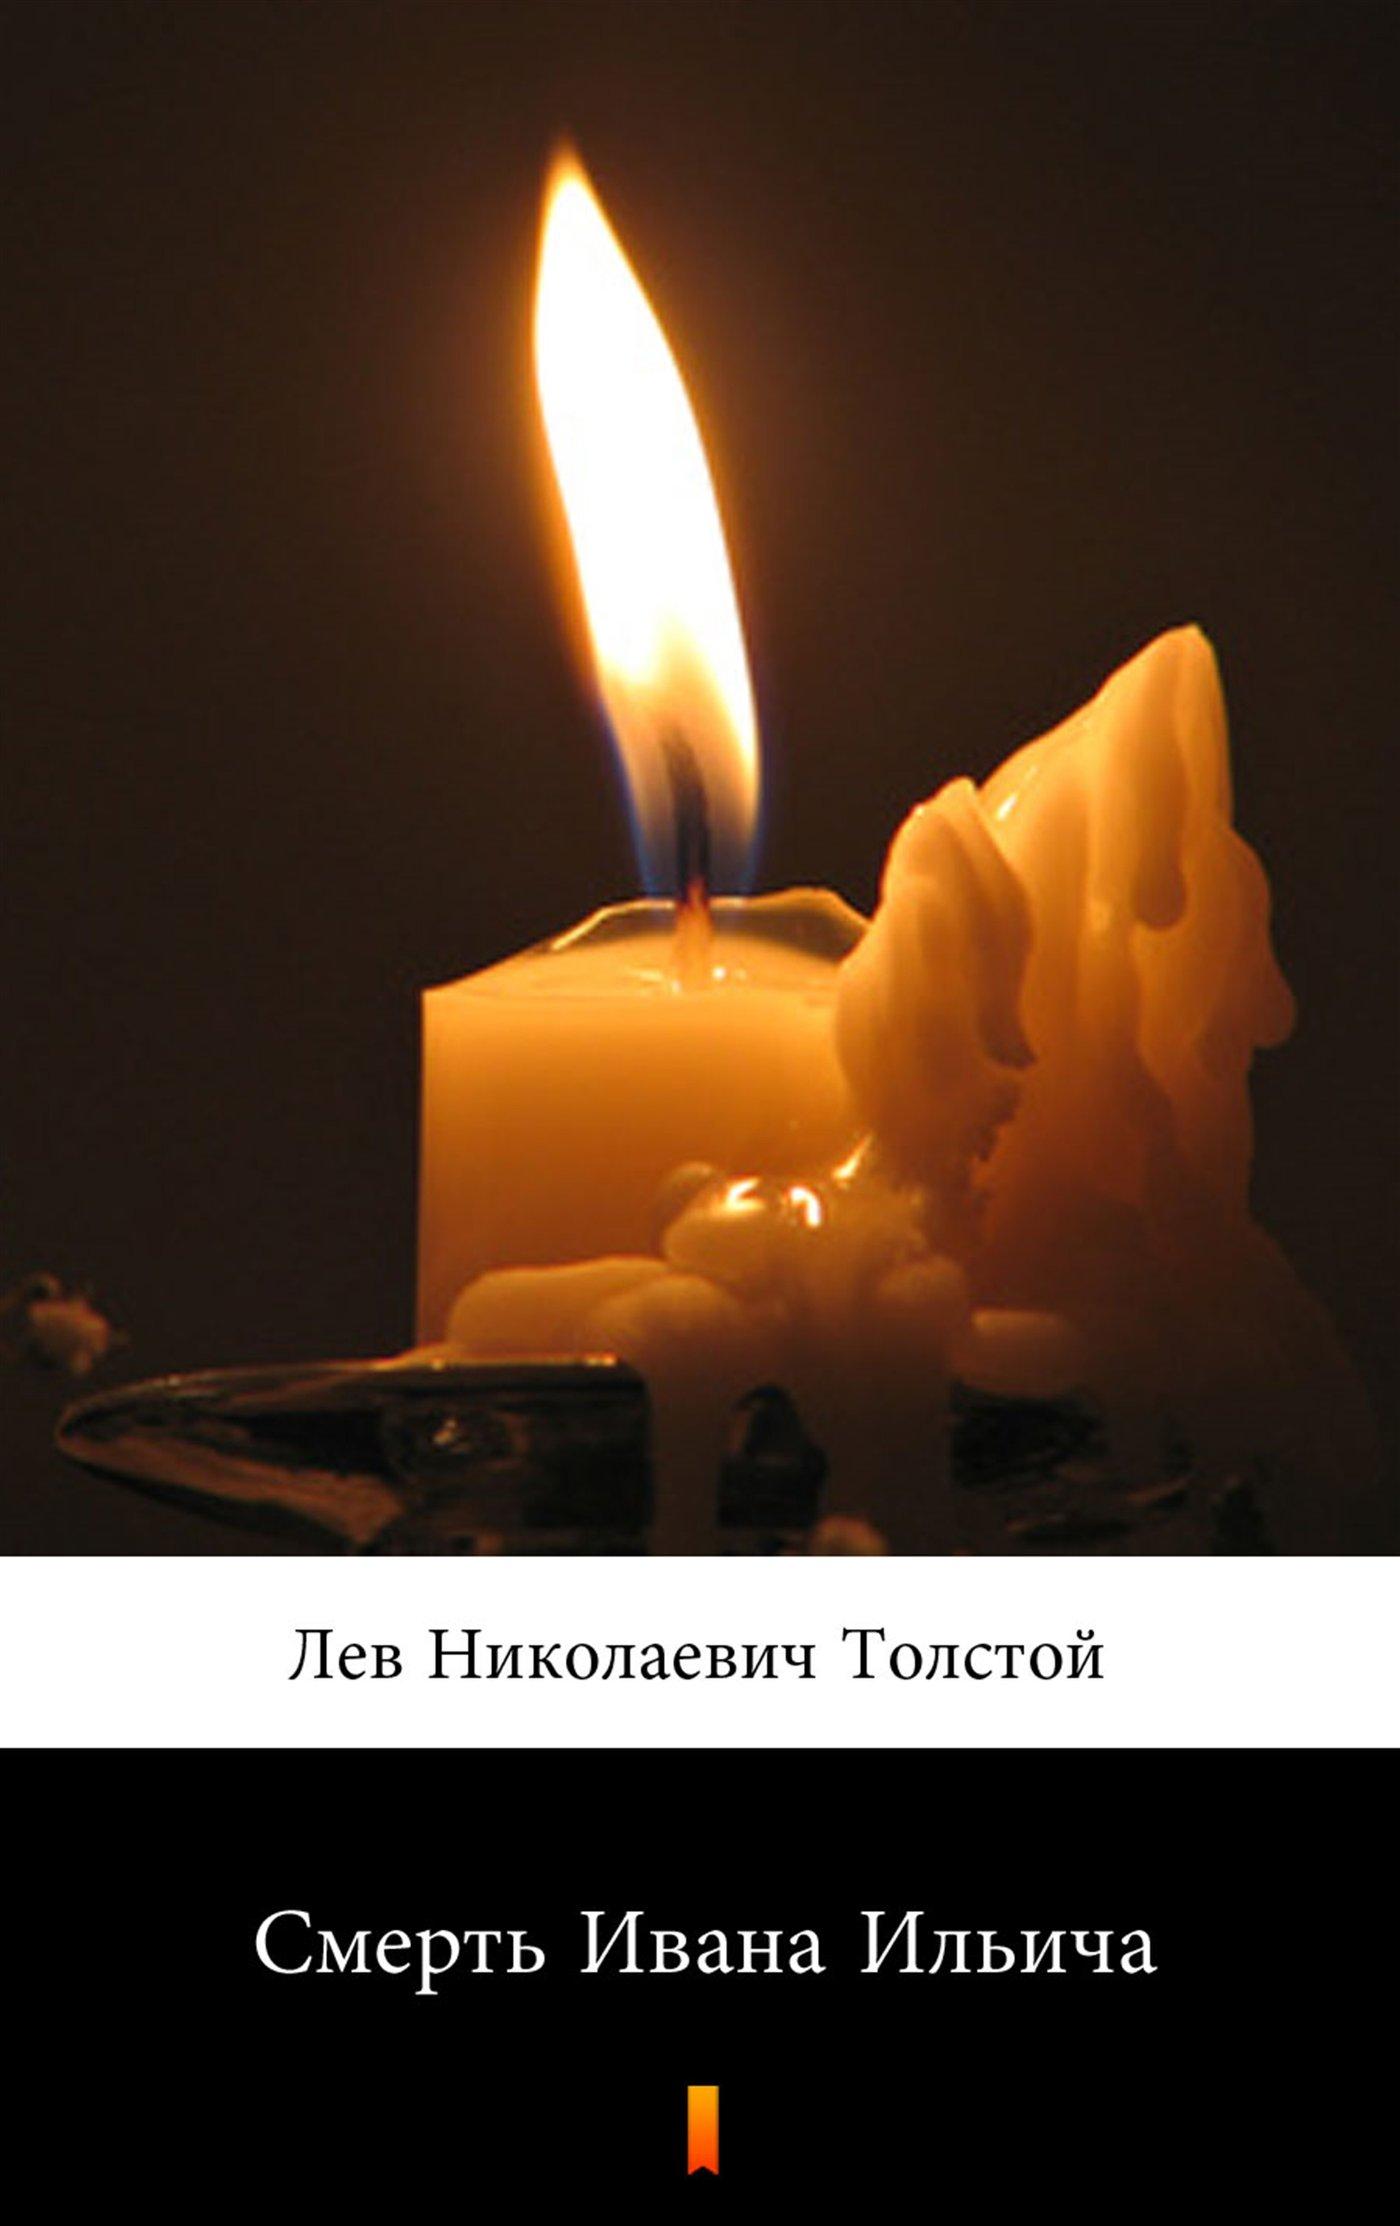 Смерть Ивана Ильича - Ebook (Książka EPUB) do pobrania w formacie EPUB